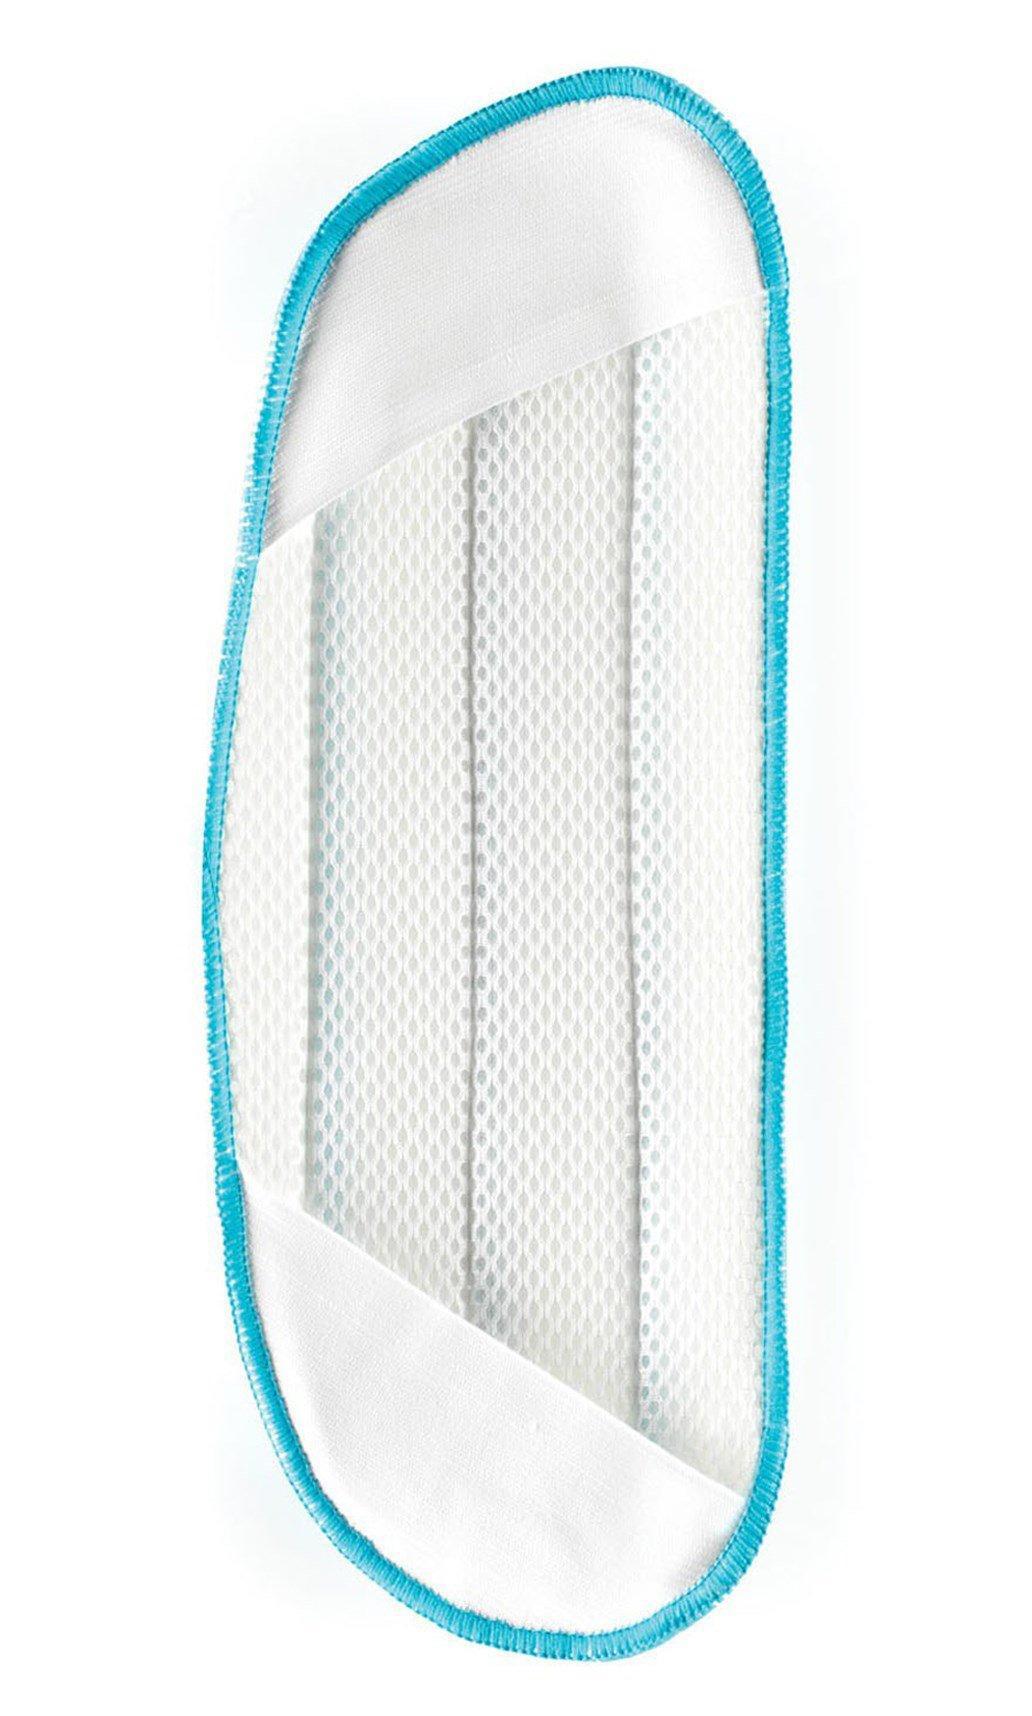 SWIPES Washable Microfiber Scrubbing Pad for Spray+Mop & Steam+Clean3